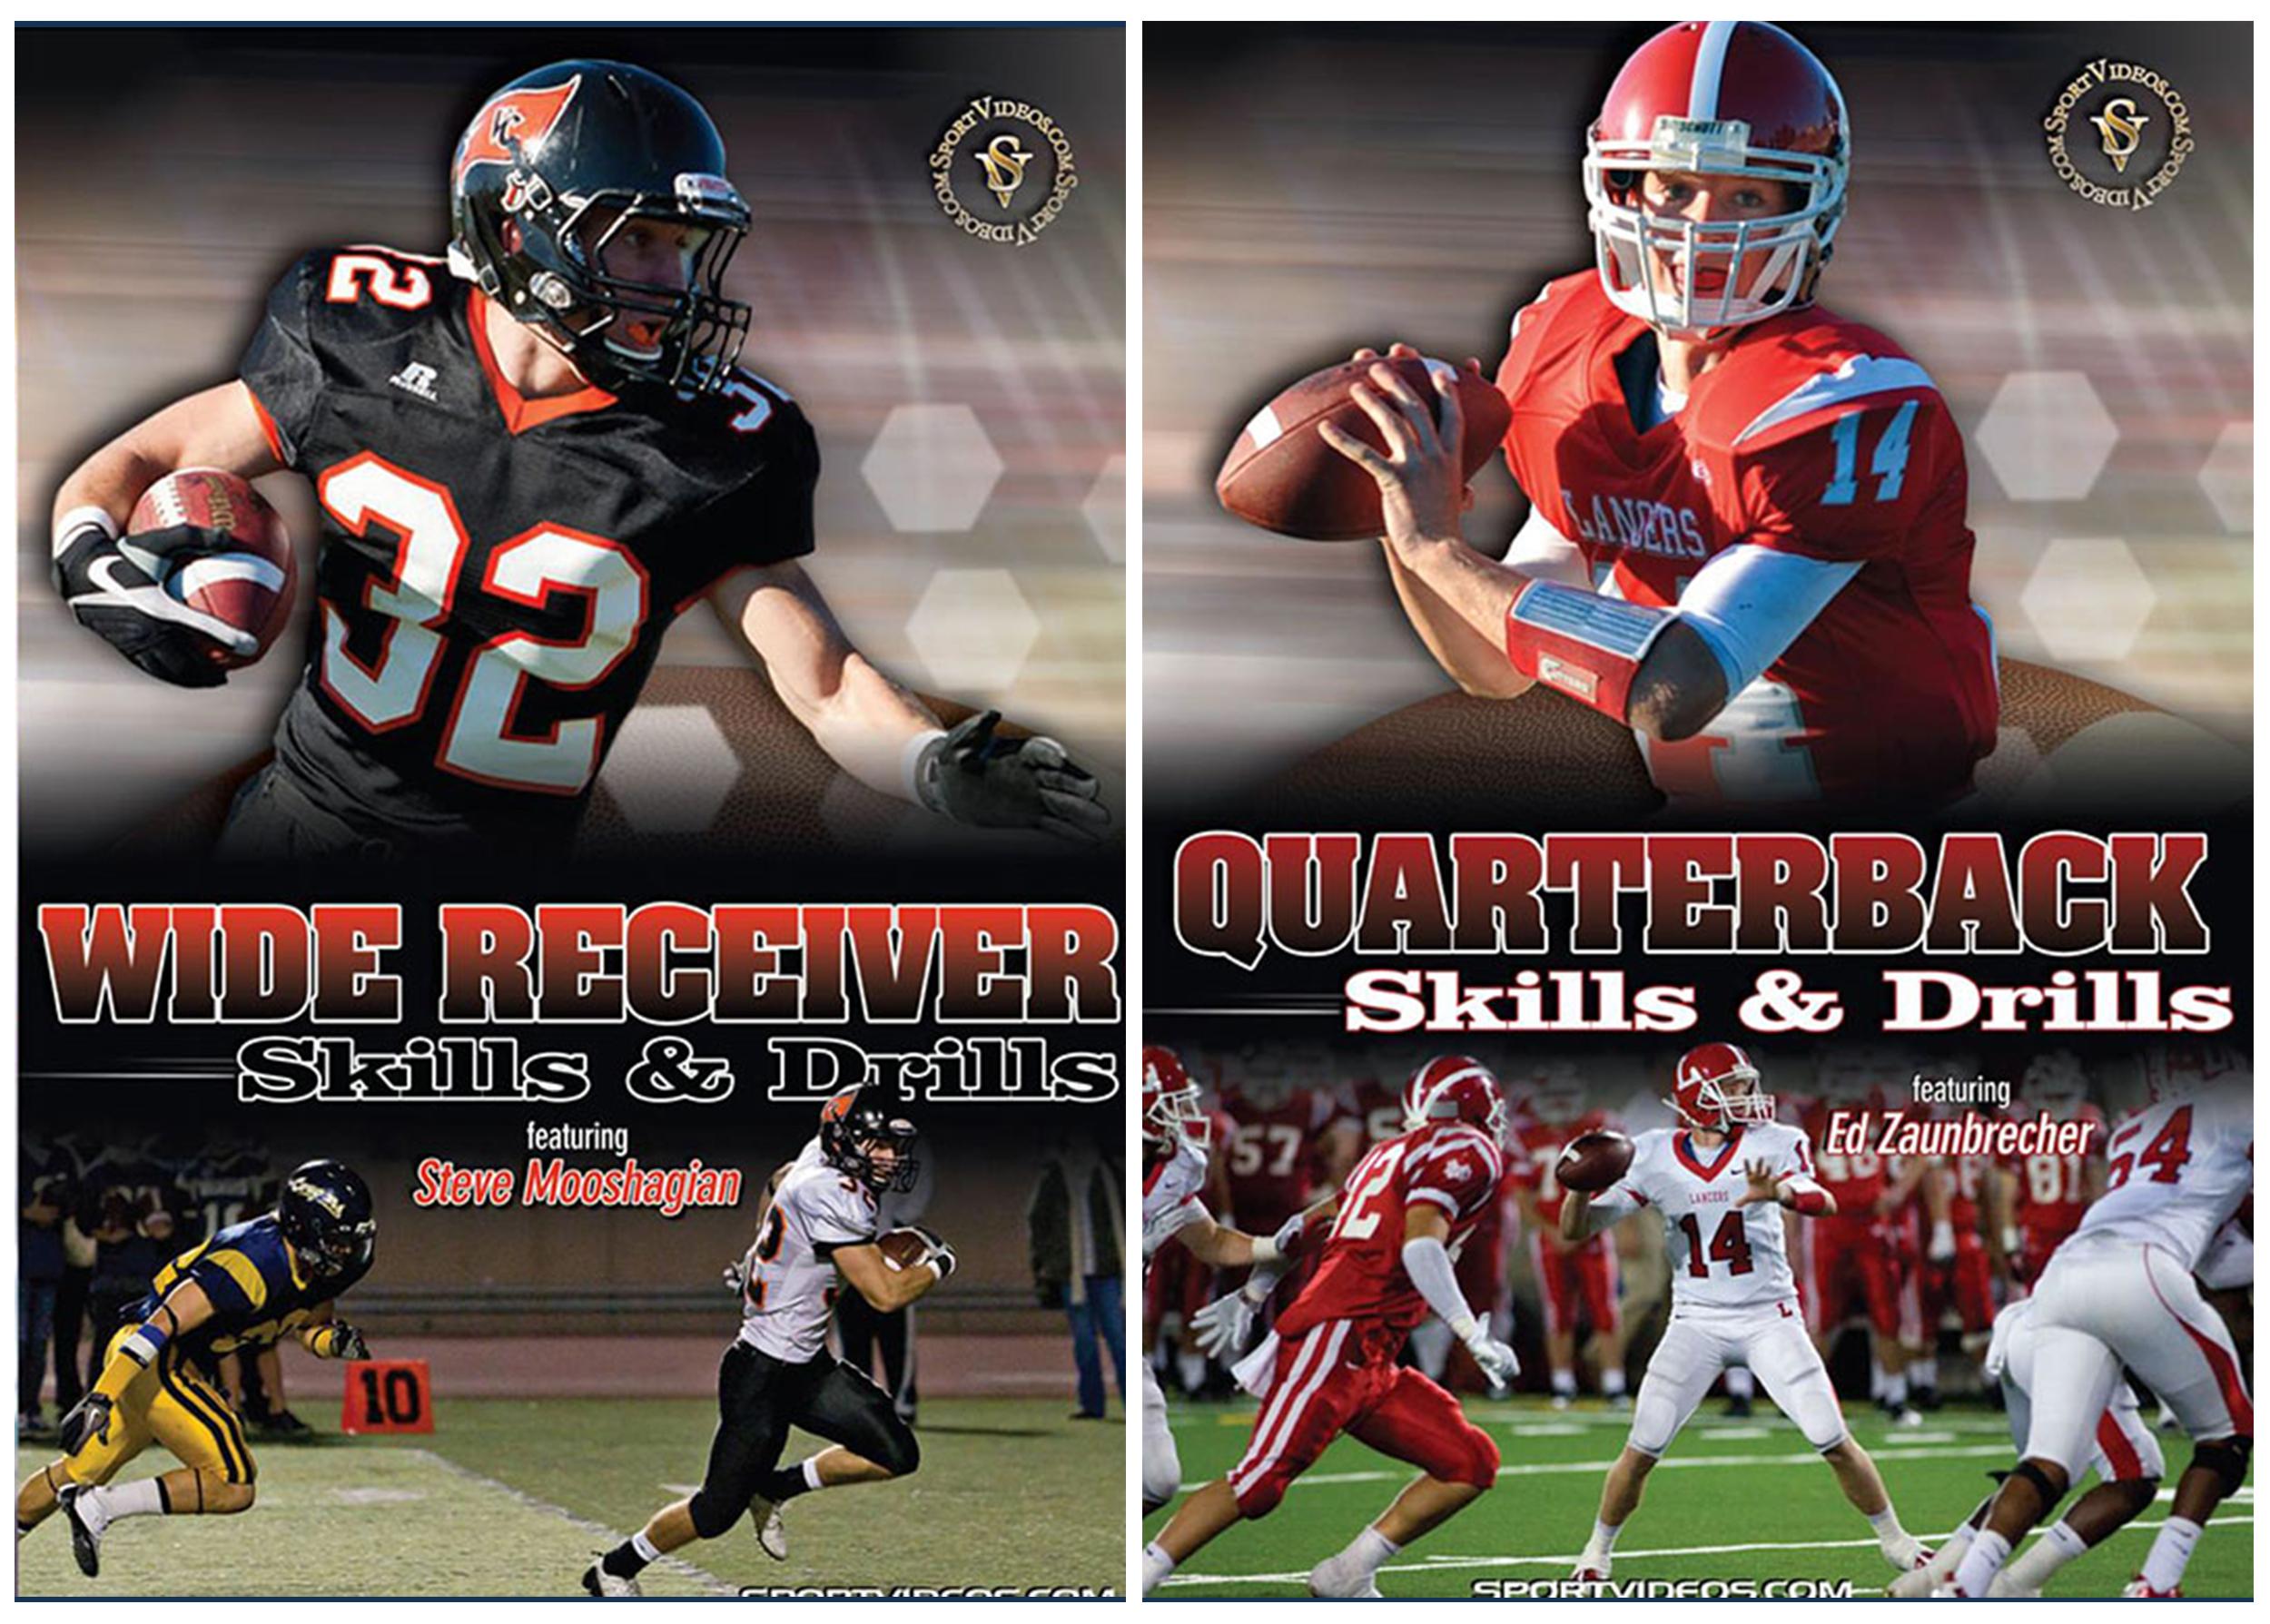 Football Training 2 DVD Set